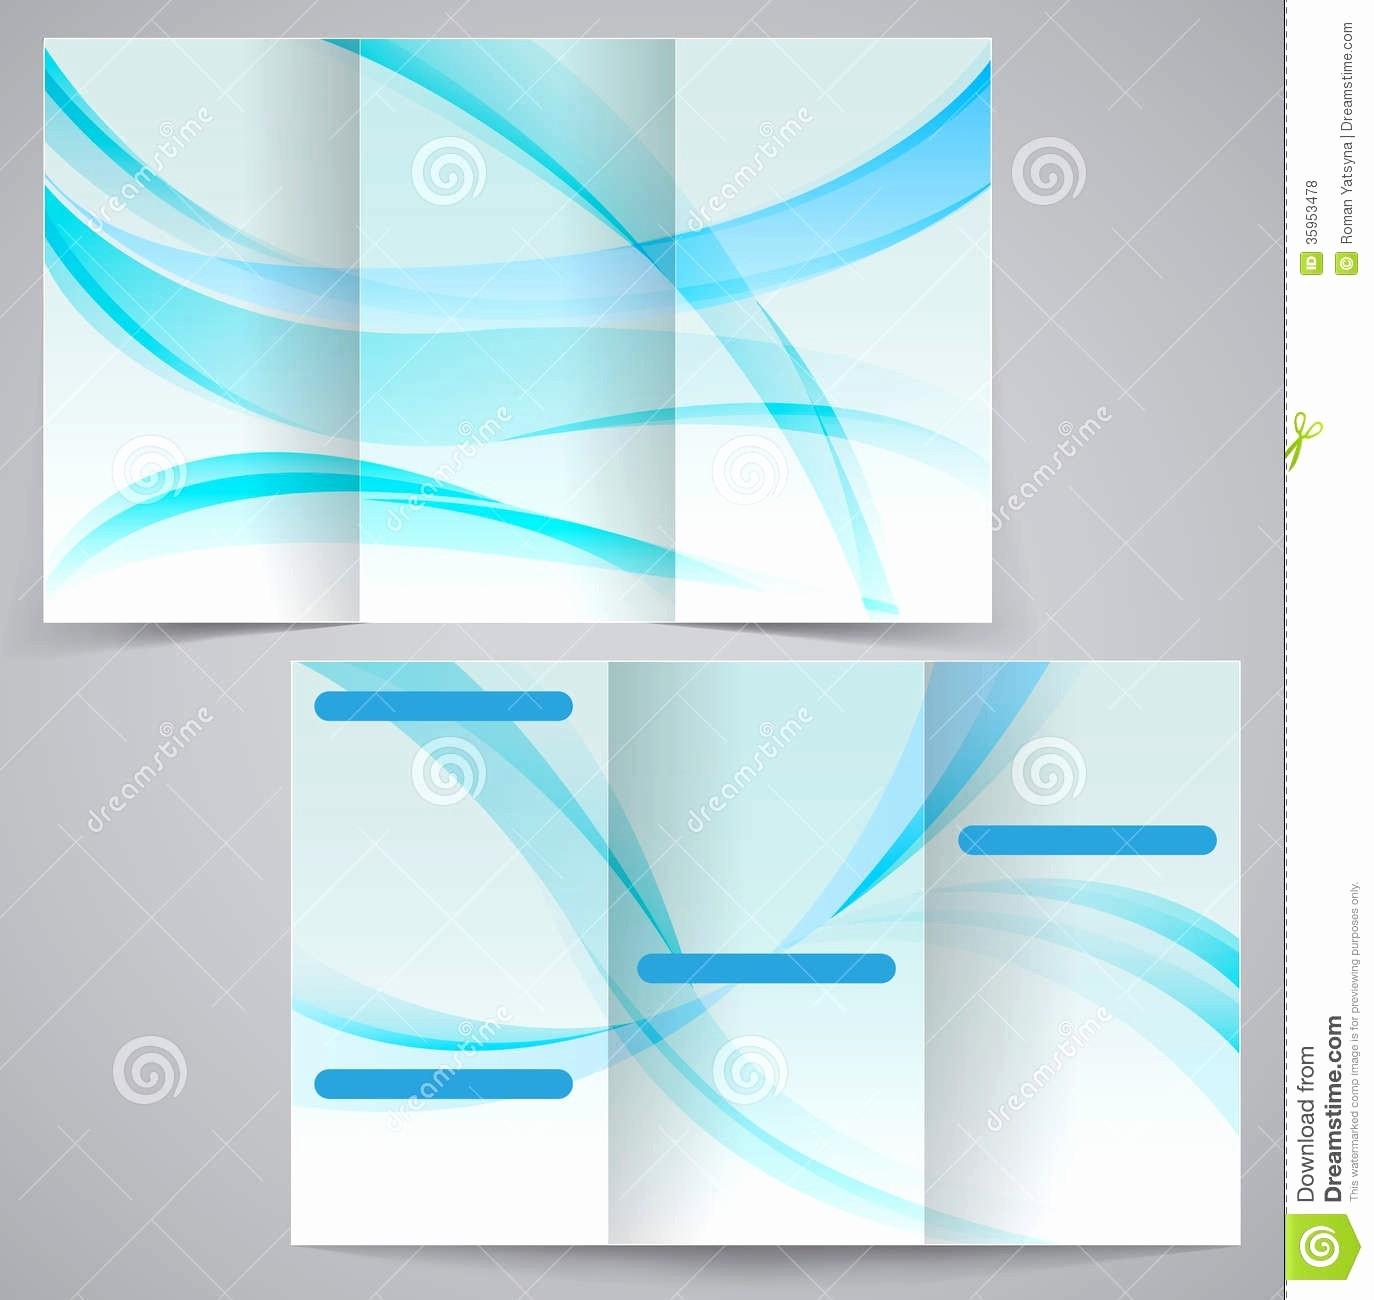 Microsoft Word Brochure Template Download Inspirational Blank Brochure Template Word Example Mughals